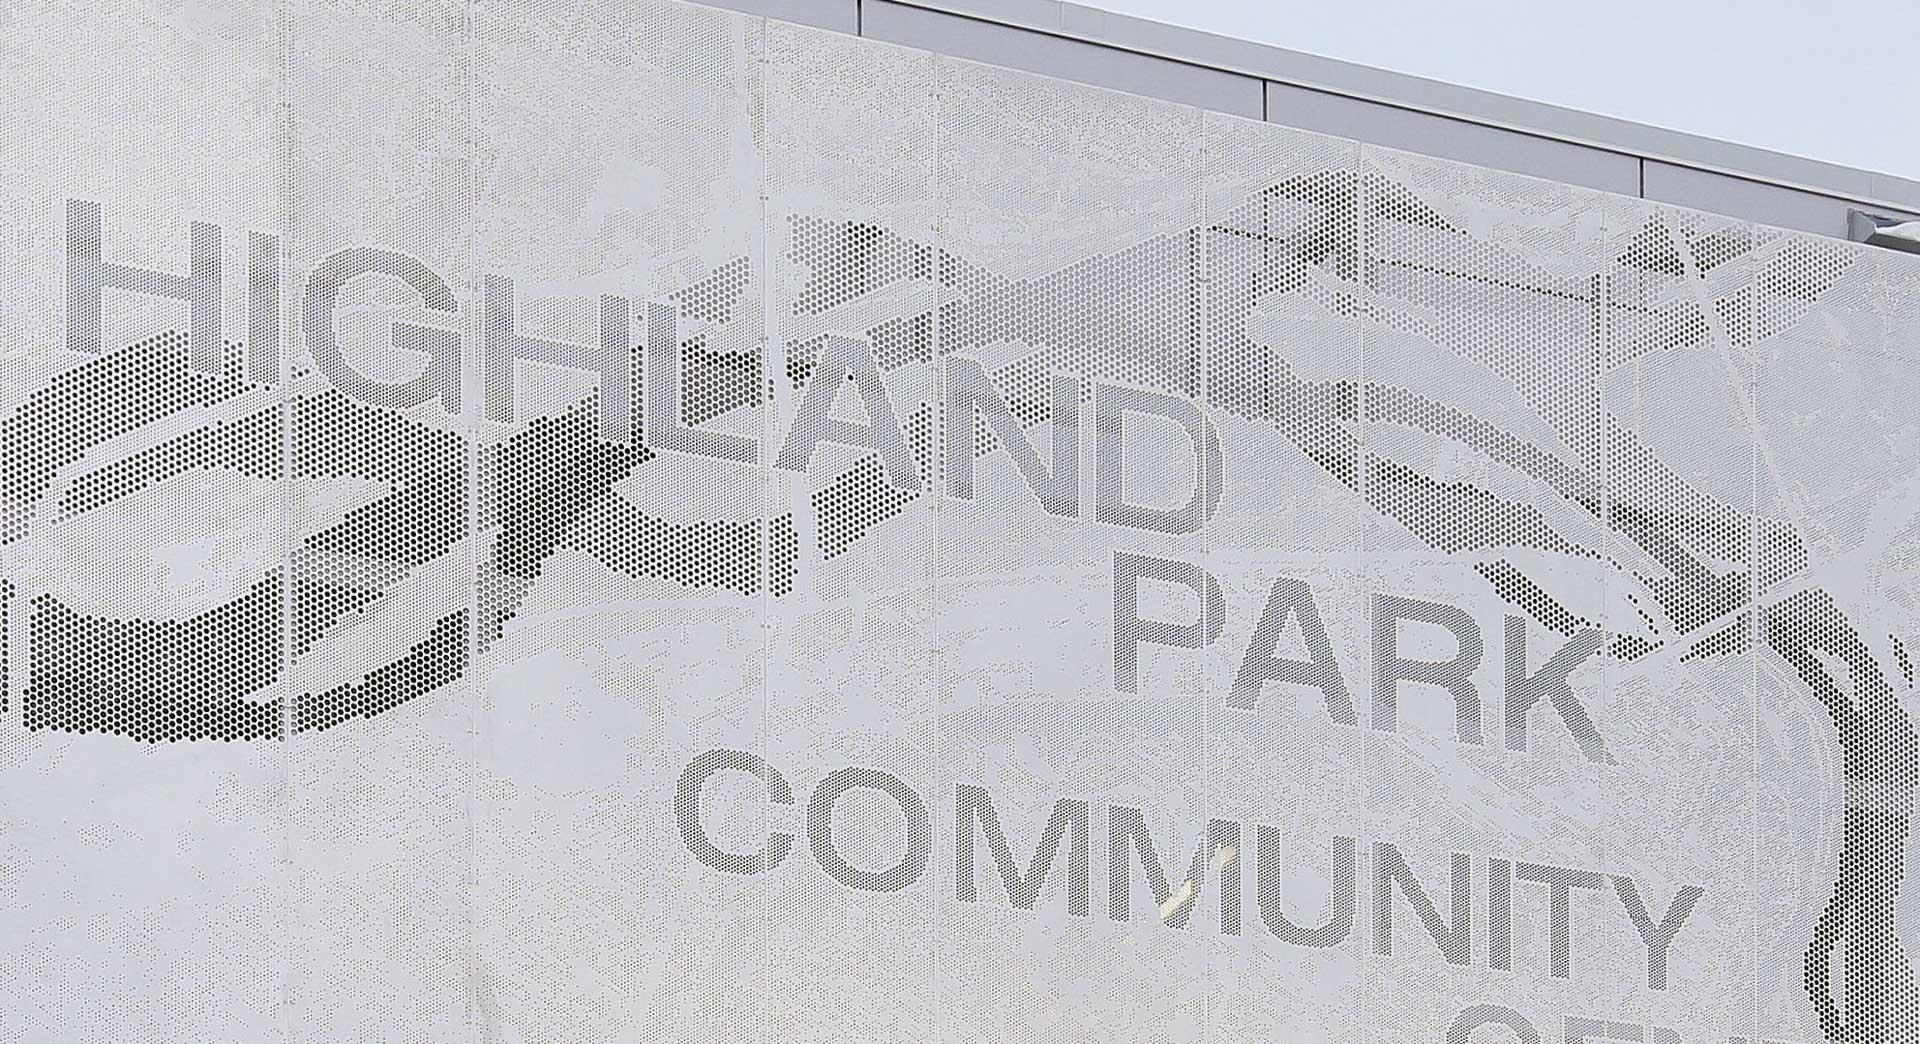 Highland Park Community Center.